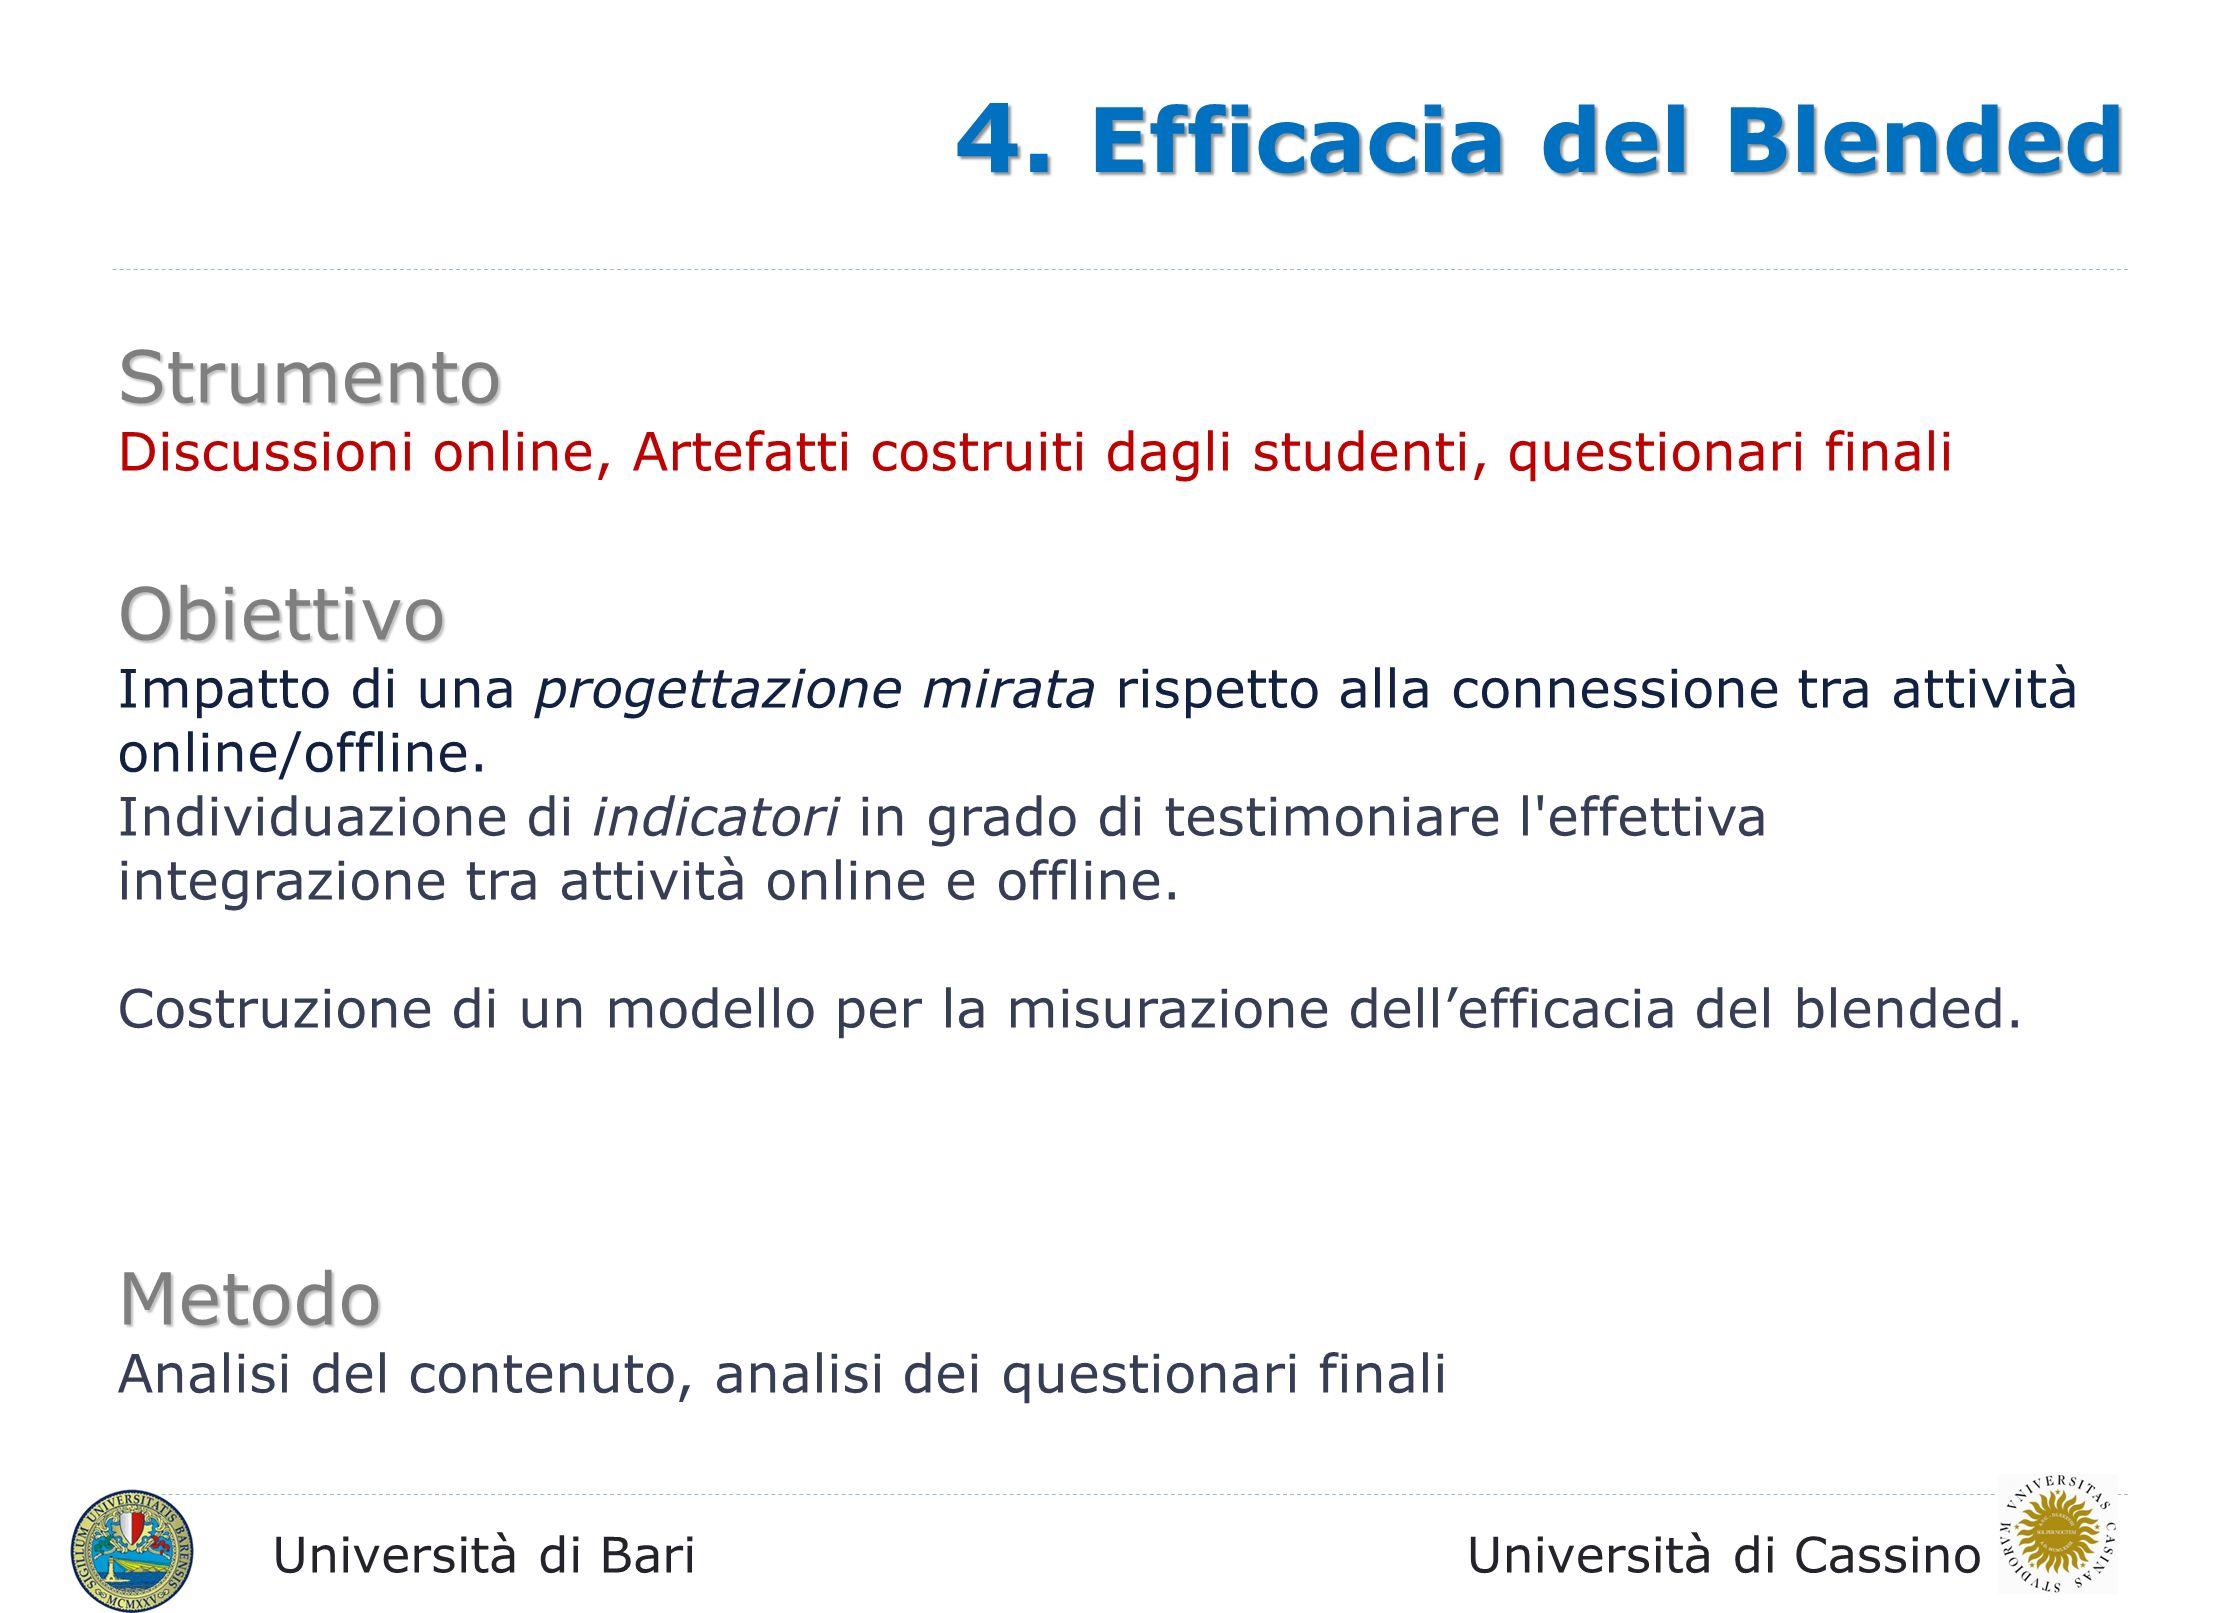 4. Efficacia del Blended Strumento Obiettivo Metodo